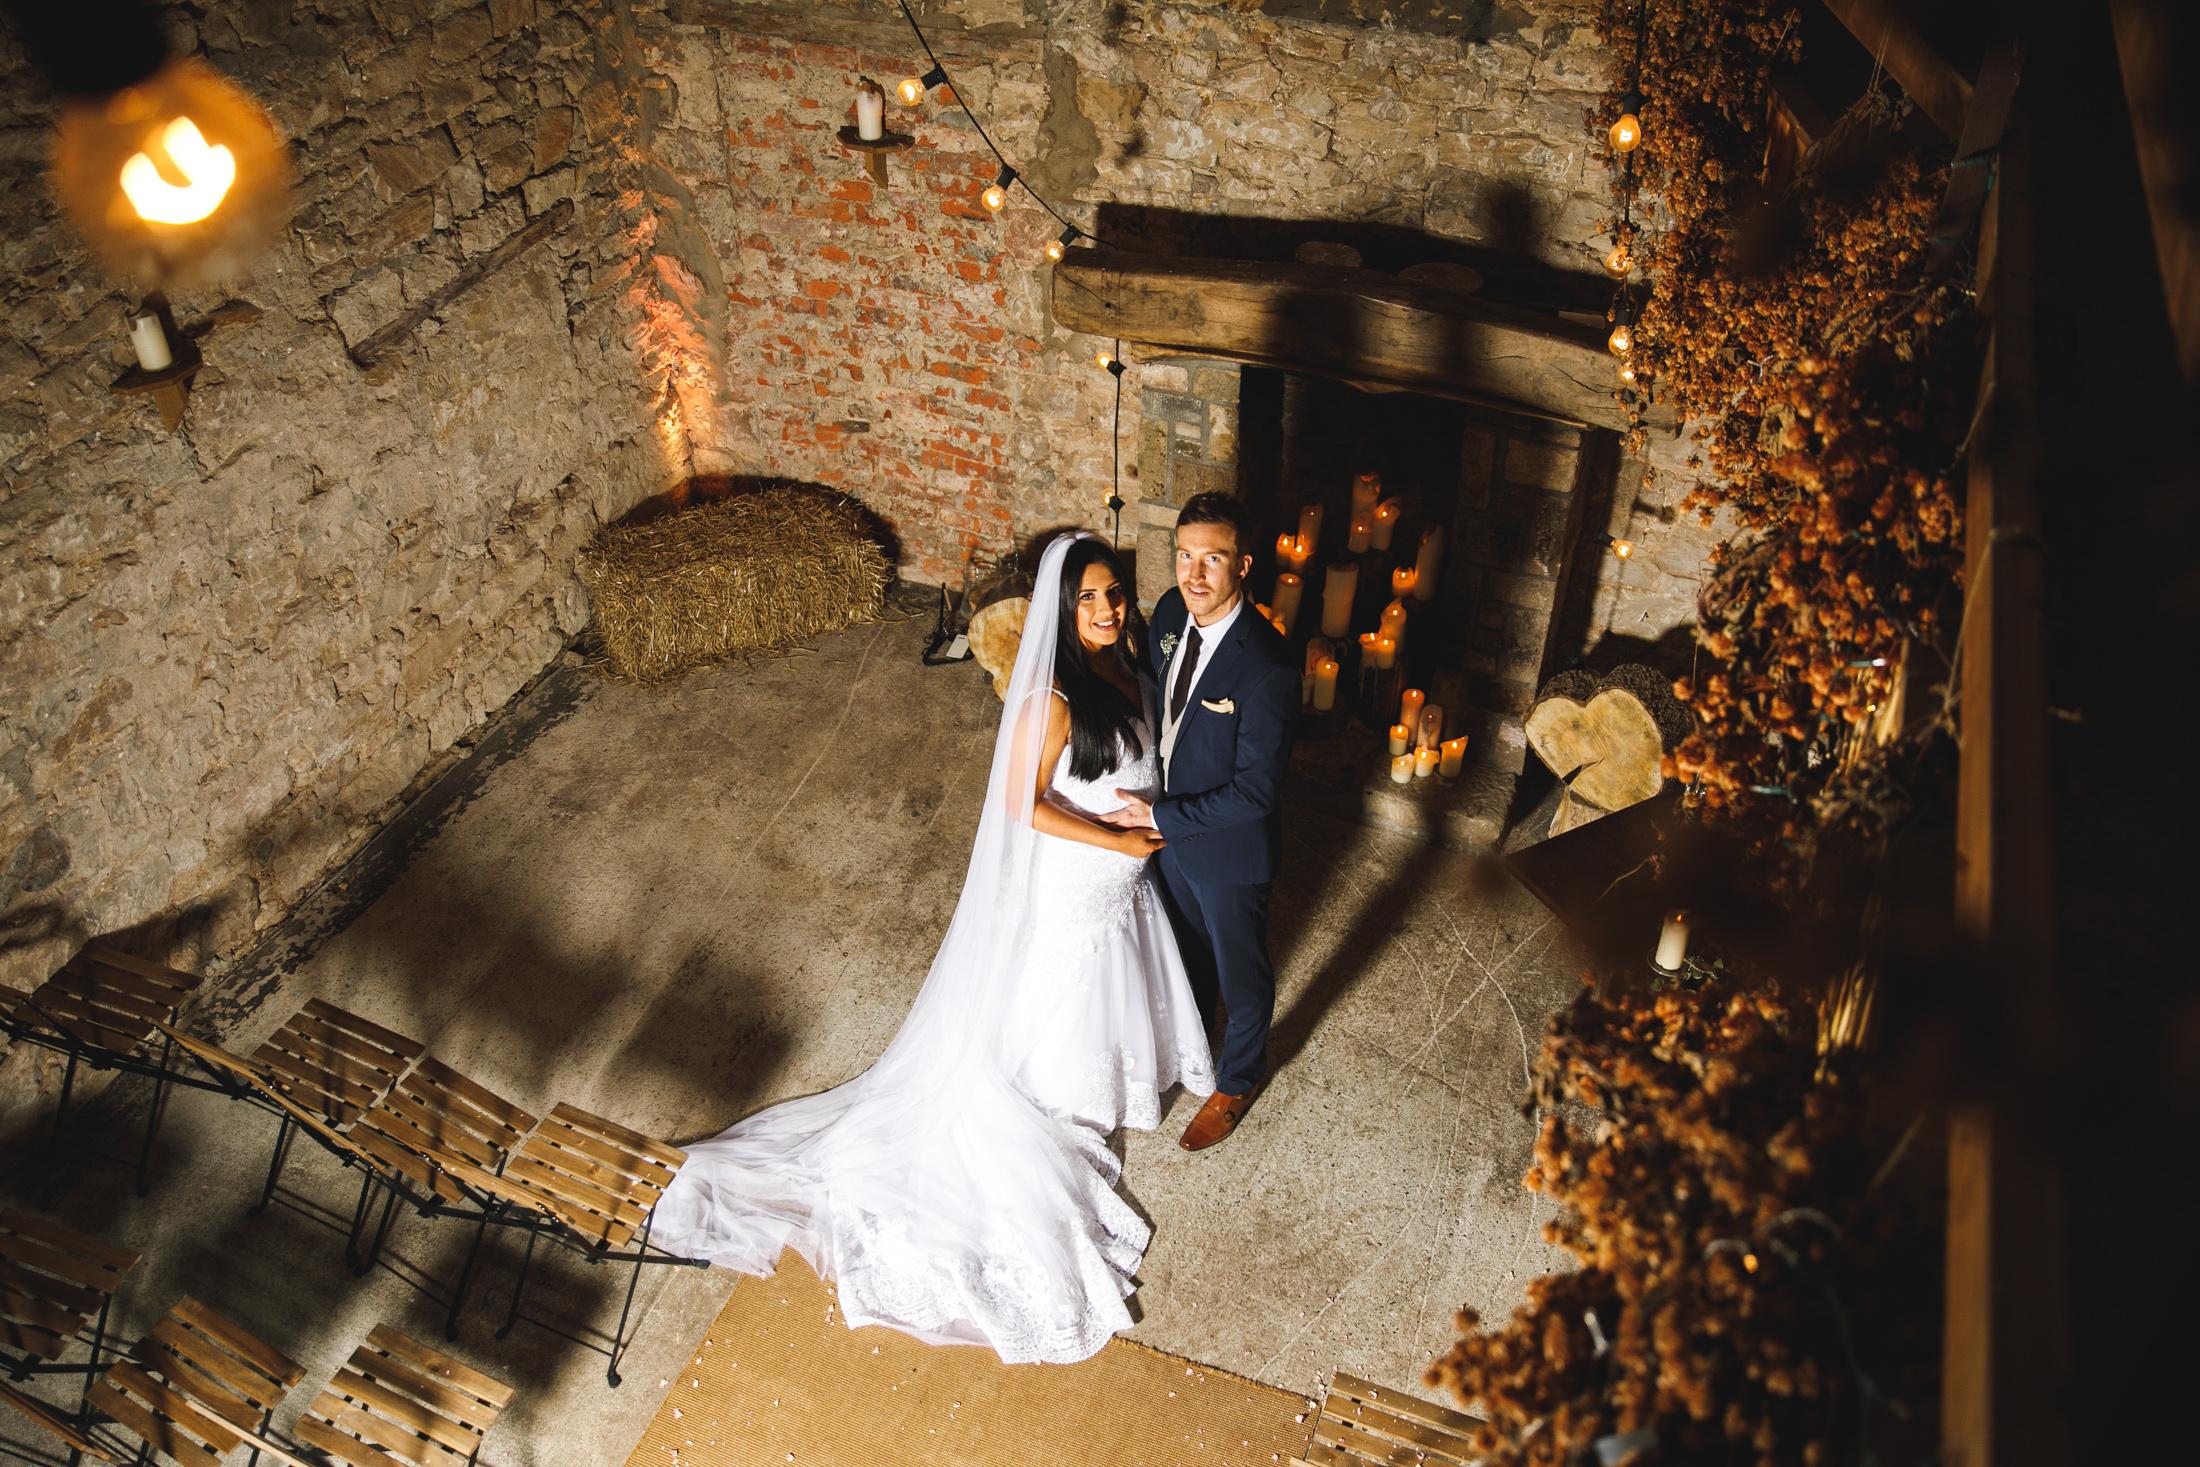 doxford barns wedding photos-61.jpg